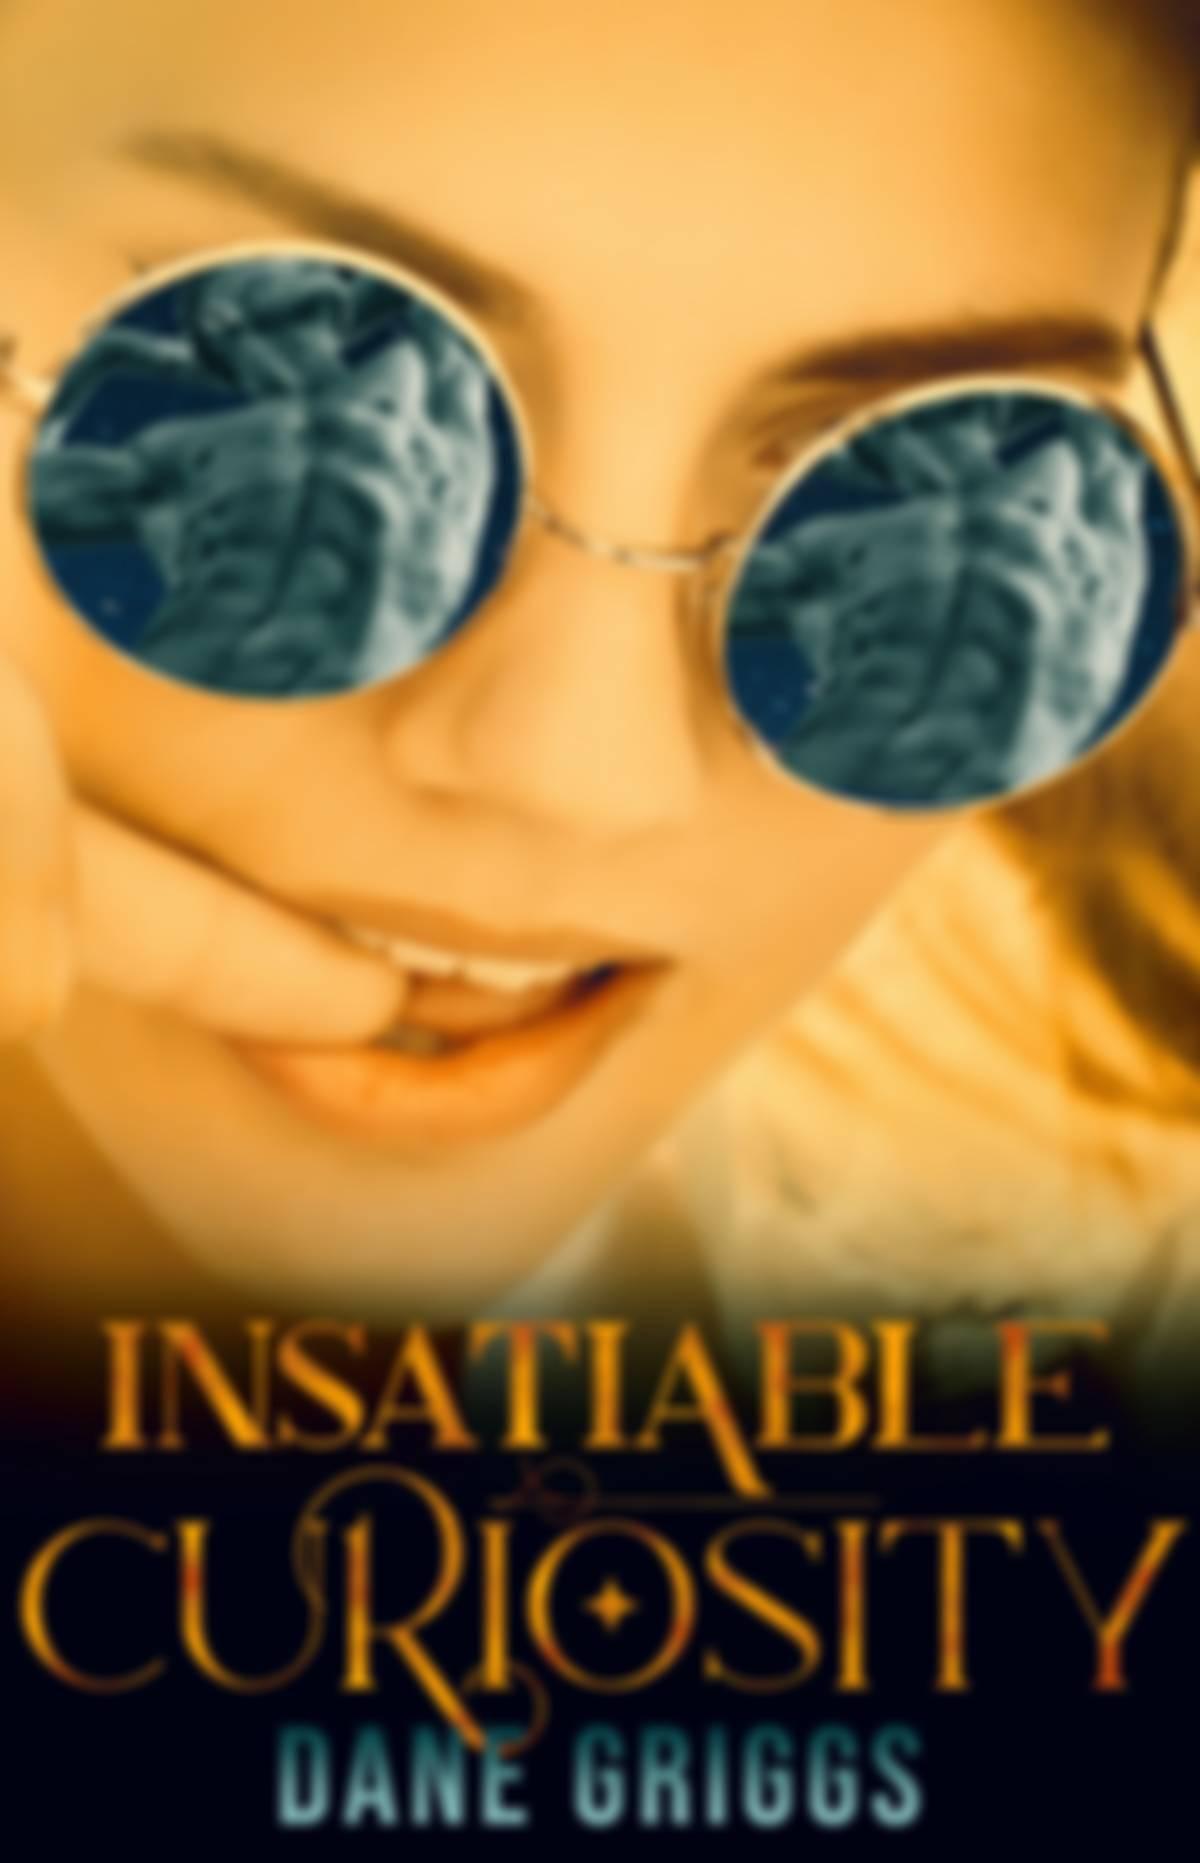 Insatiable Curiosity book cover